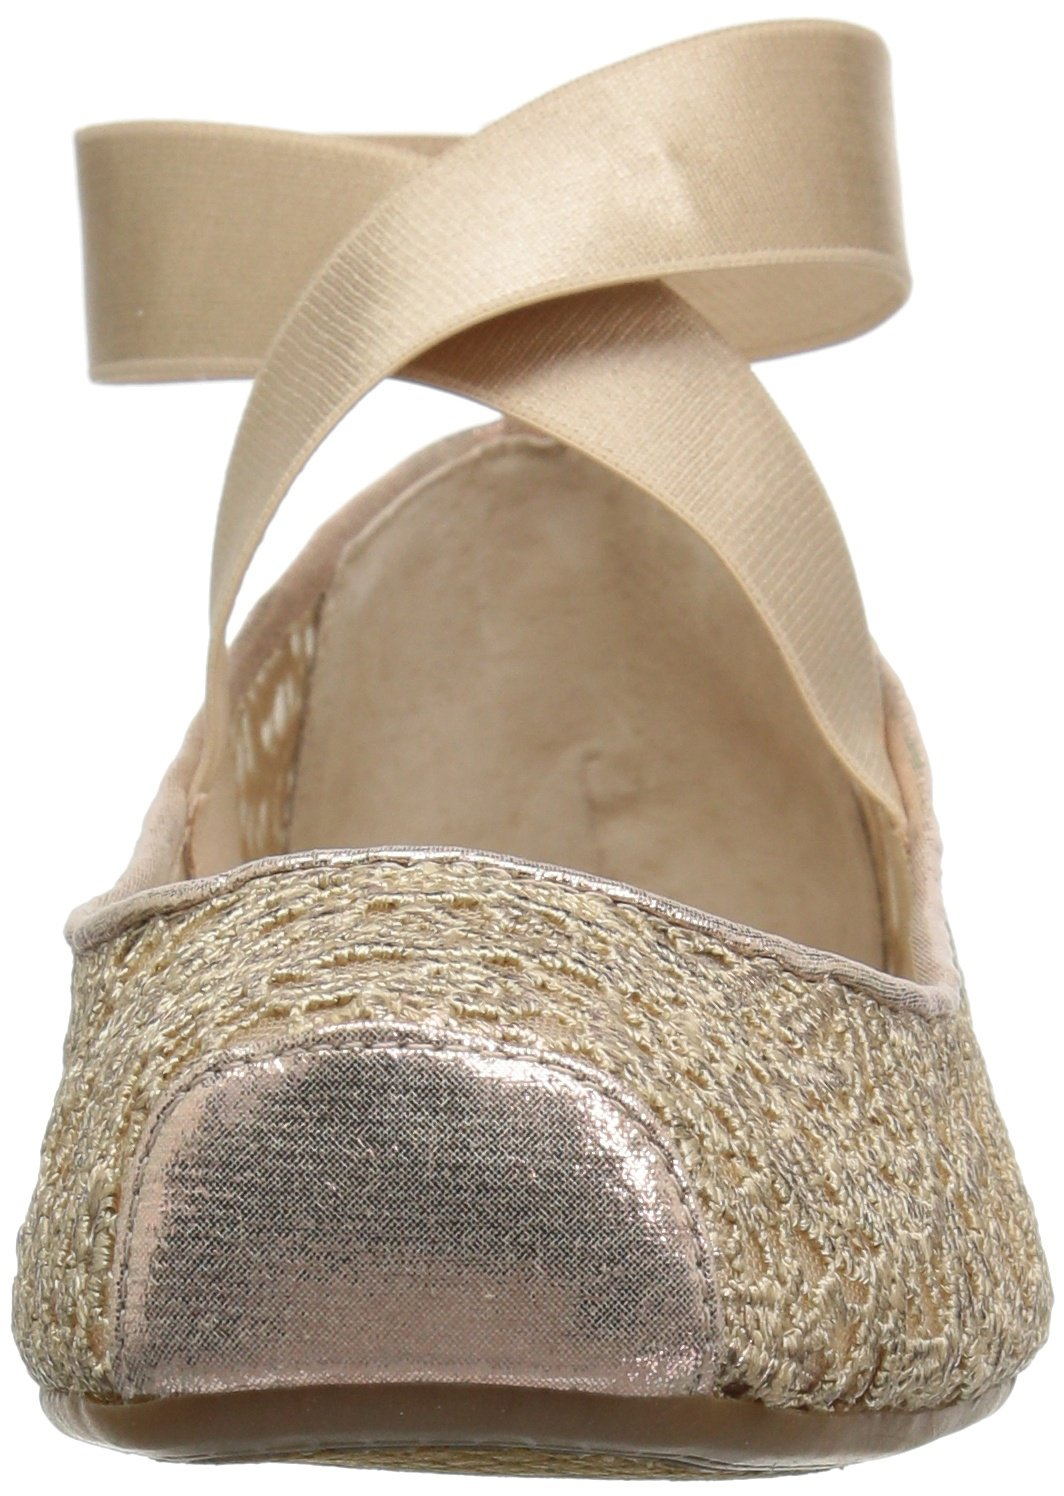 Jessica Simpson Women's 6.5 Maggda Ballet Flat B079FDQX3Z 6.5 Women's M US Champagne 2e6450